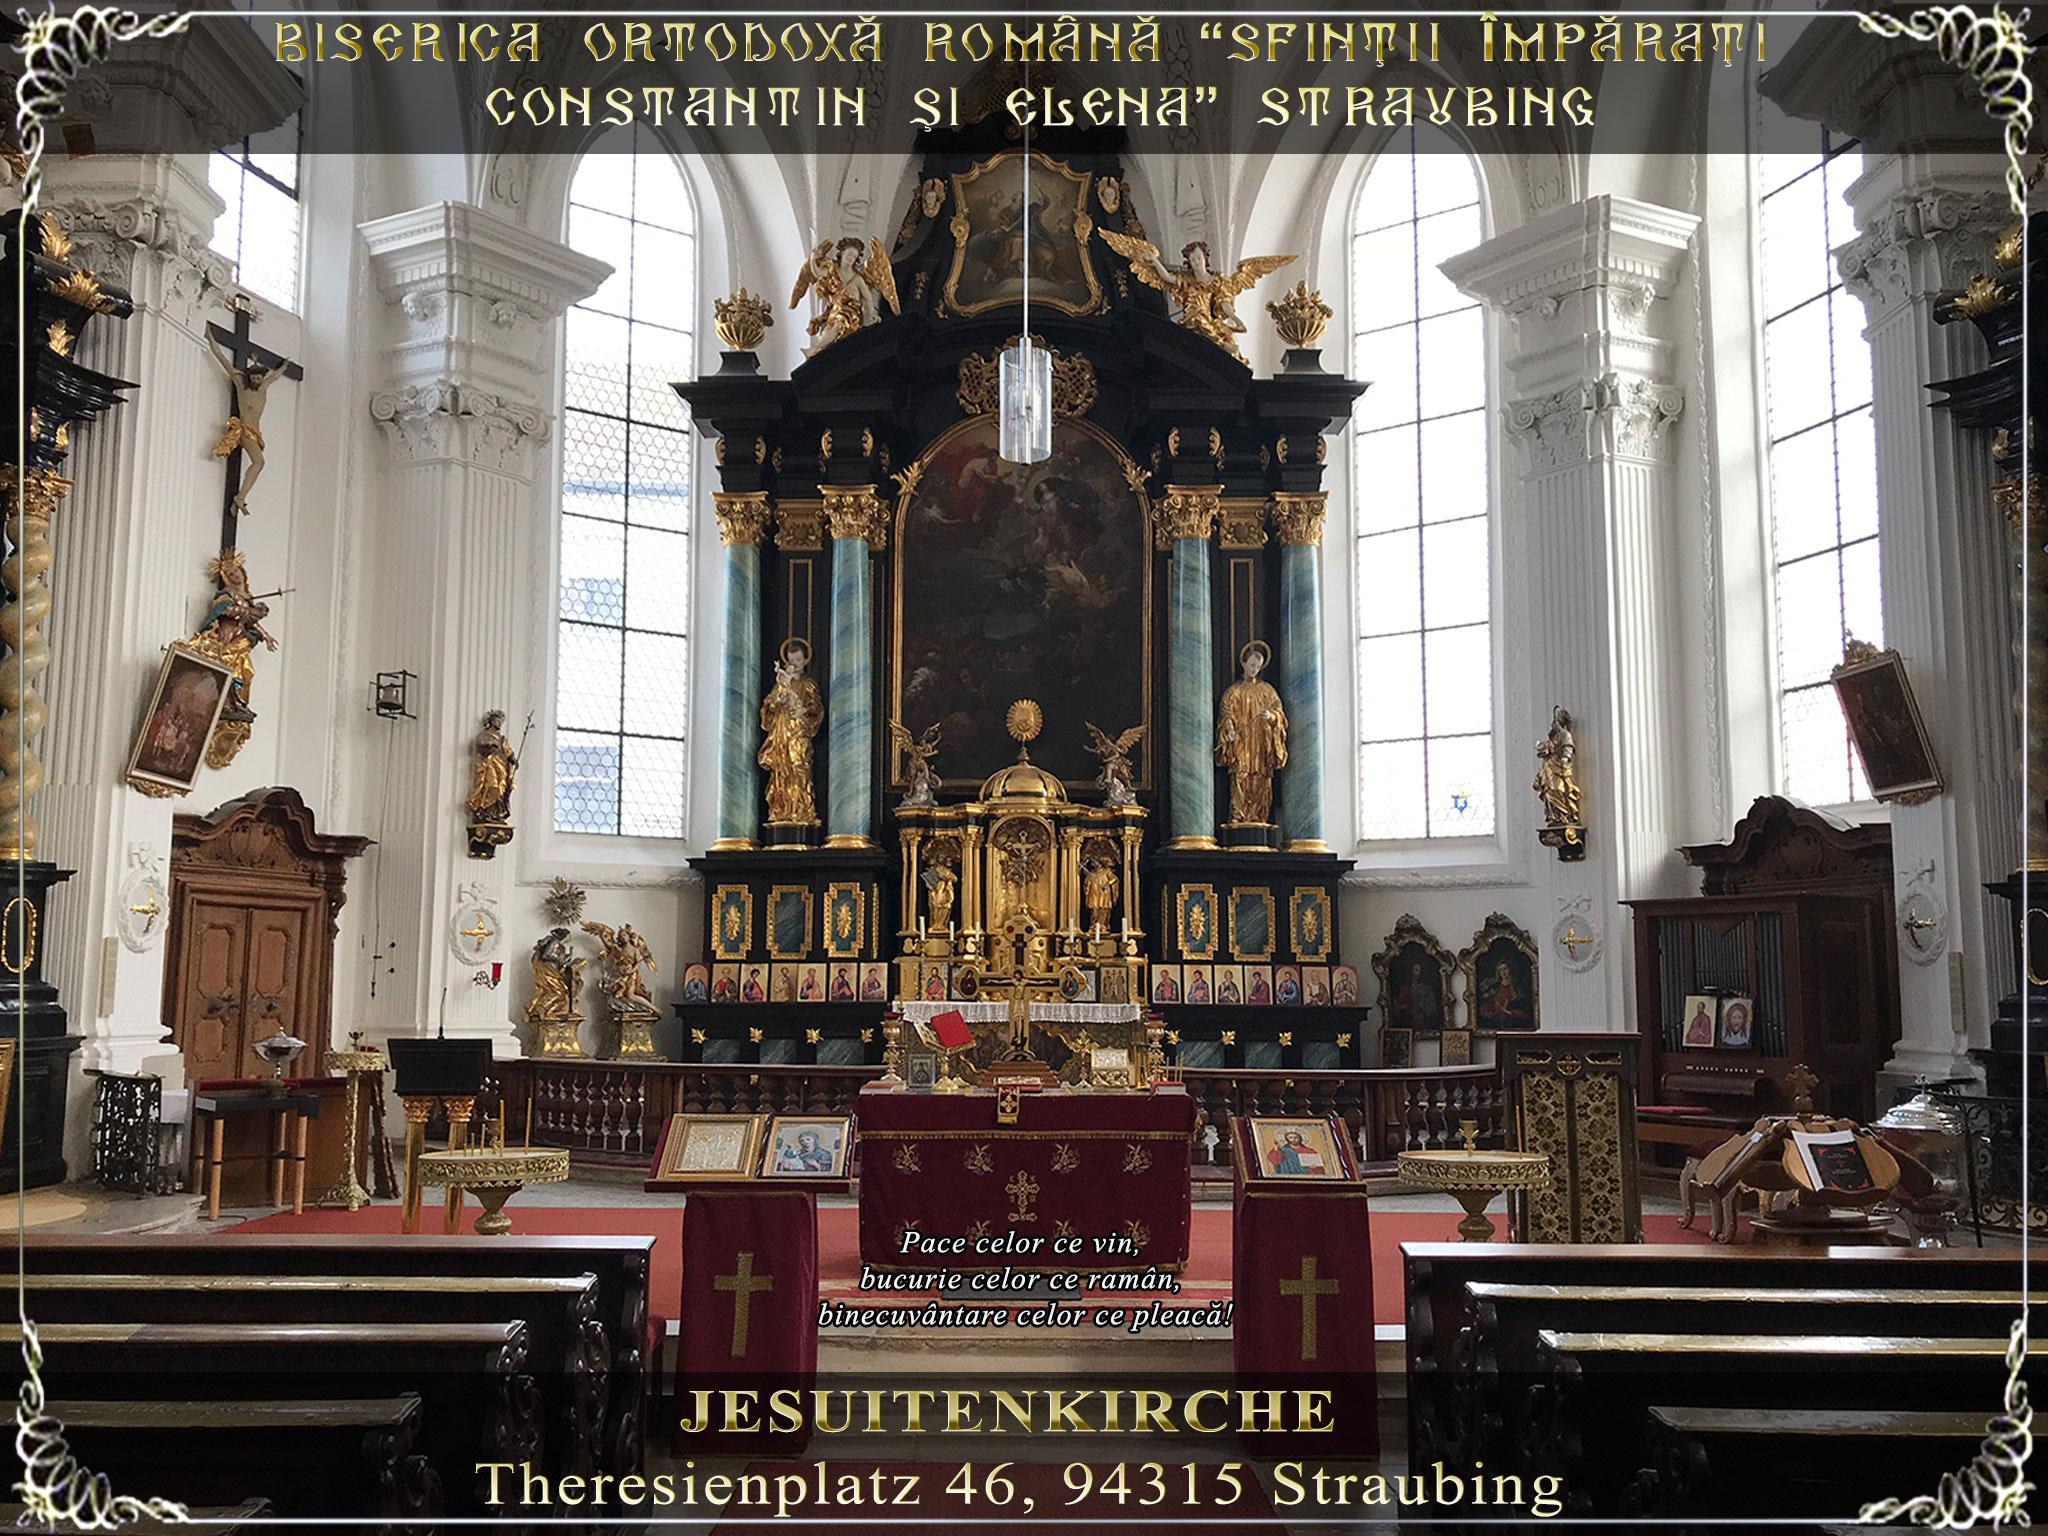 Jesuitenkirche Straubing - Program Liturgic 2020